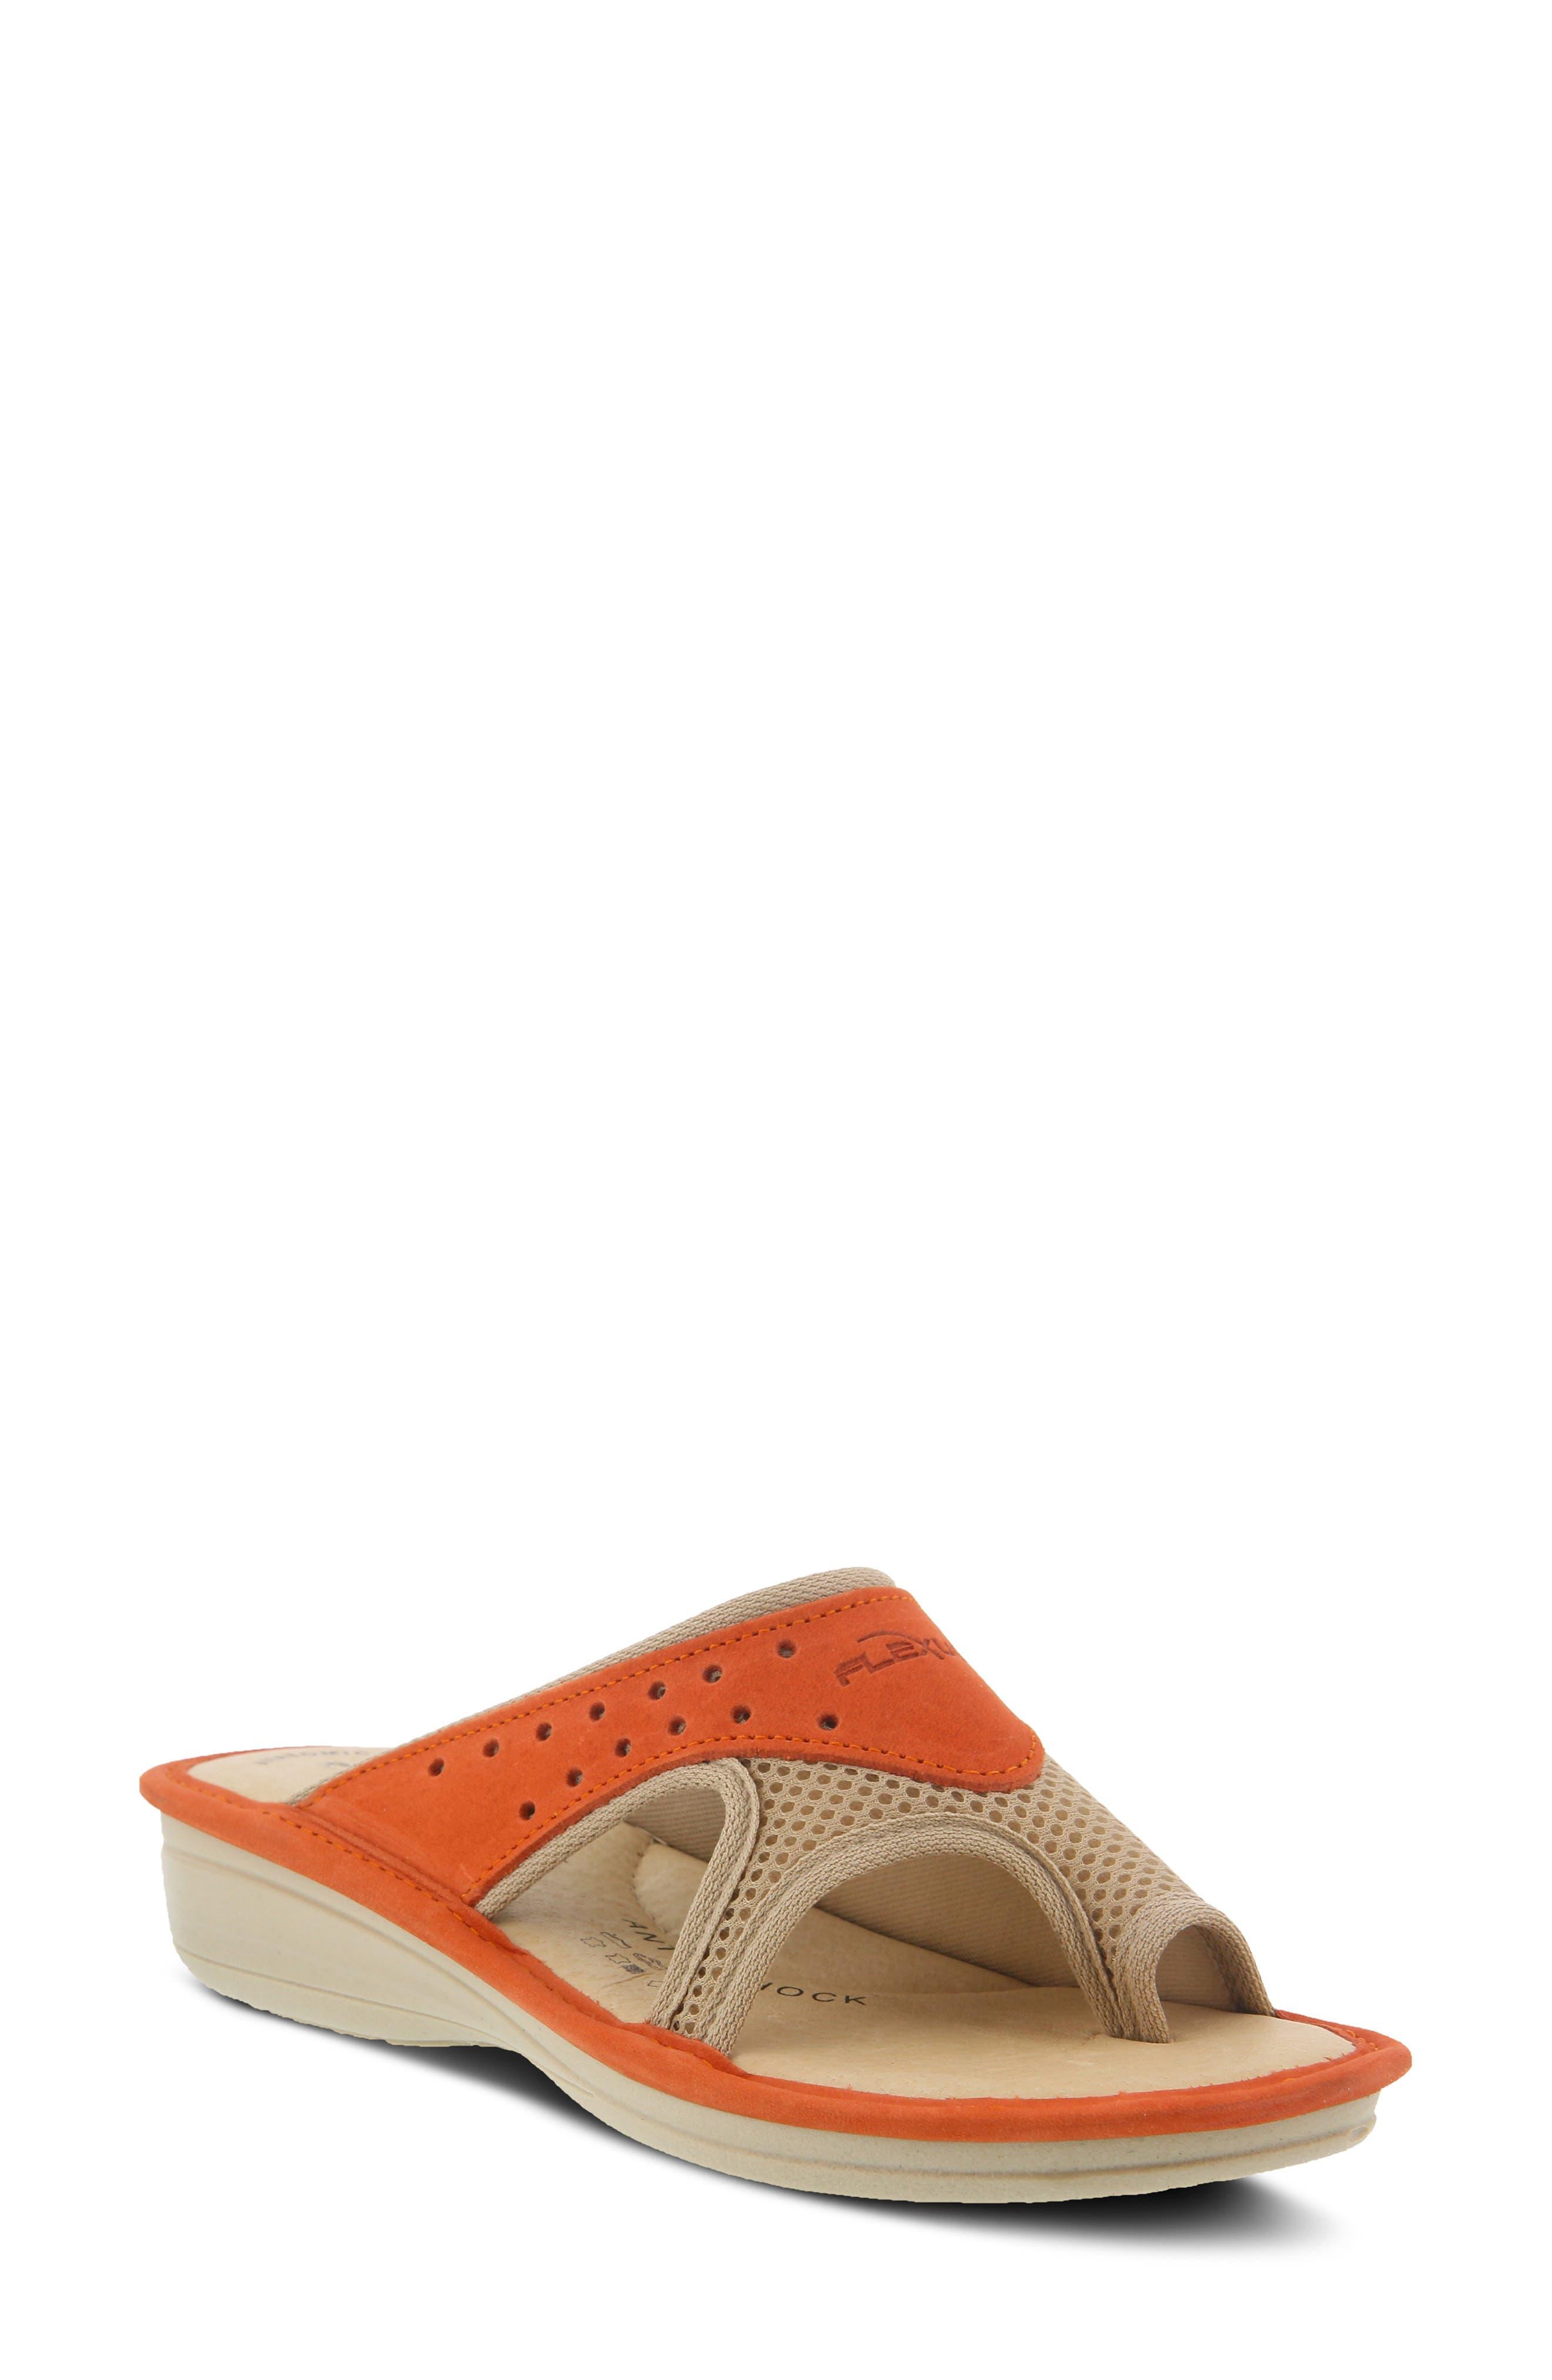 Pascalle Slide Sandal